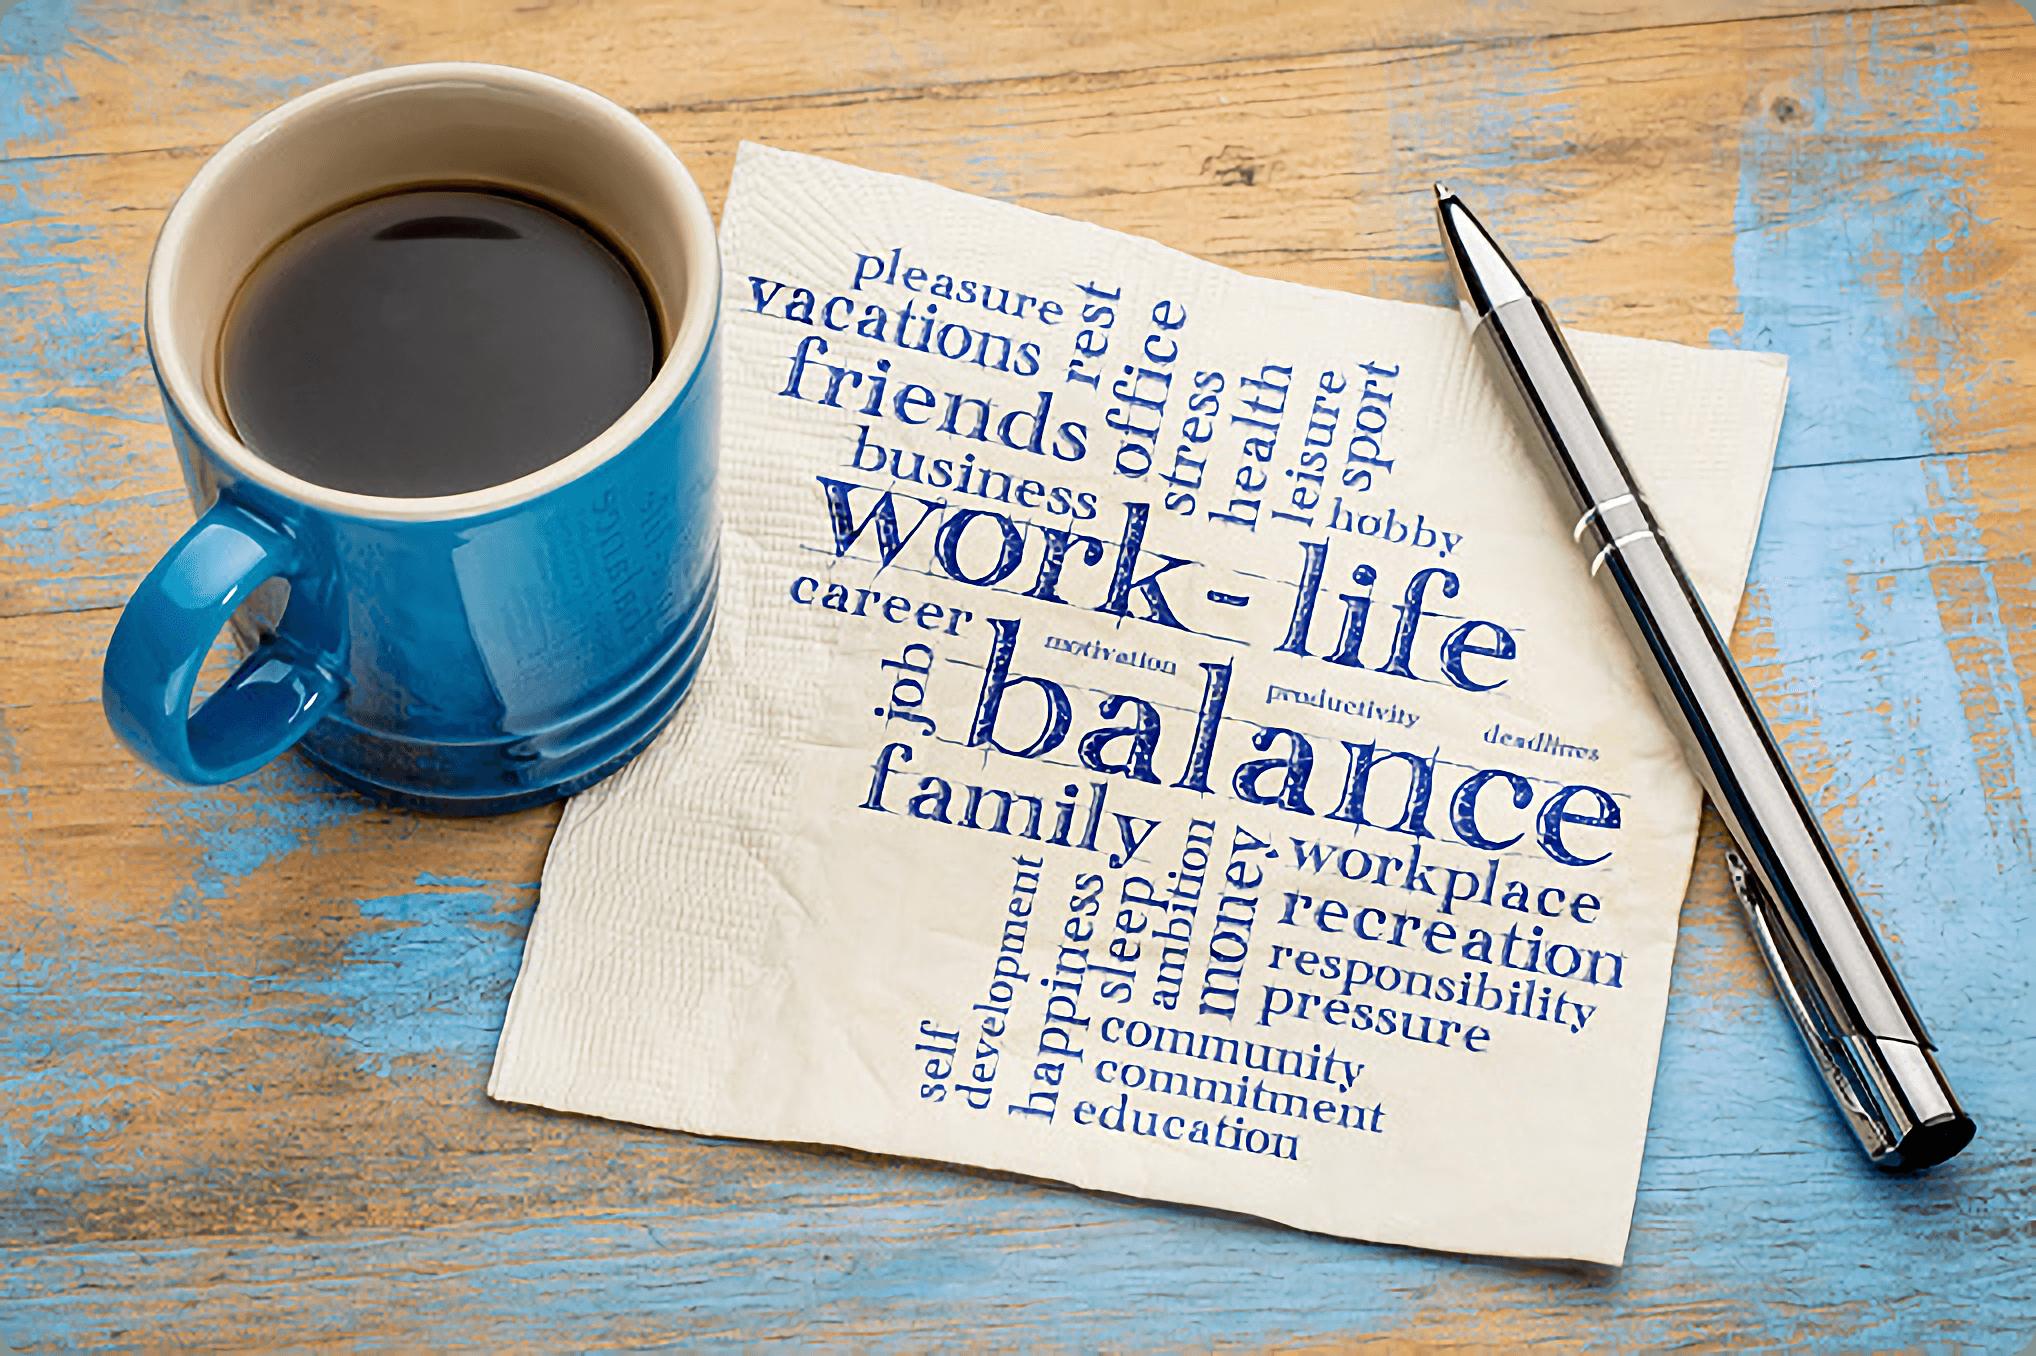 Work life balance is essential